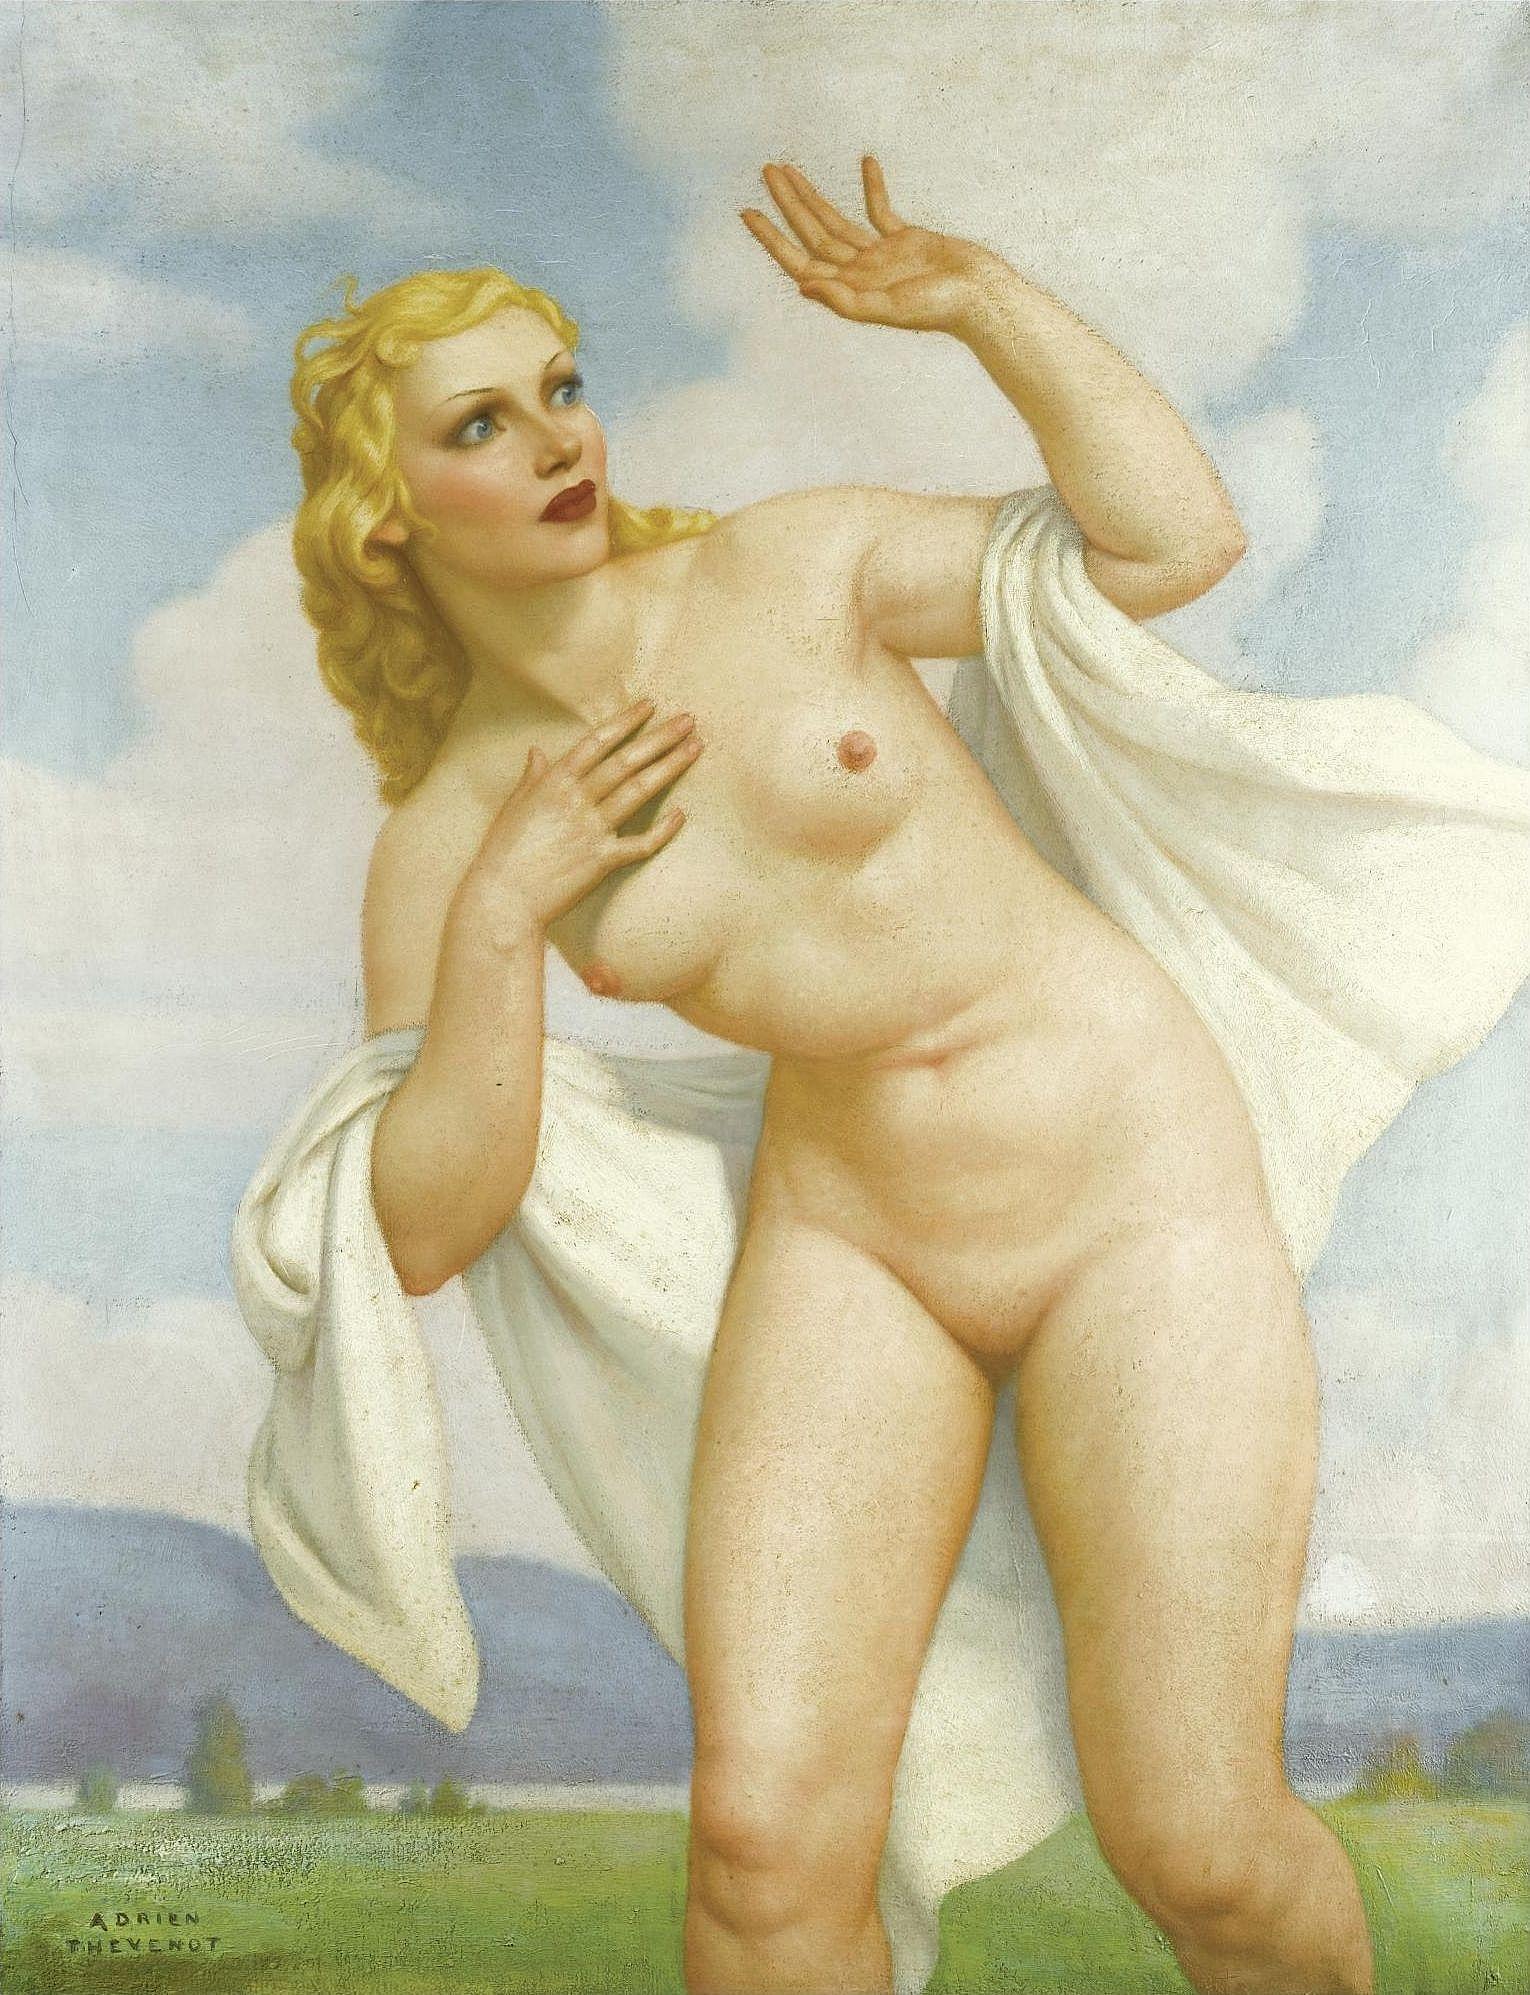 Adrien Thevenot, 1889-1922. Обнаженная в пейзаже. 125.5 х 96.8 см. Частная коллекция